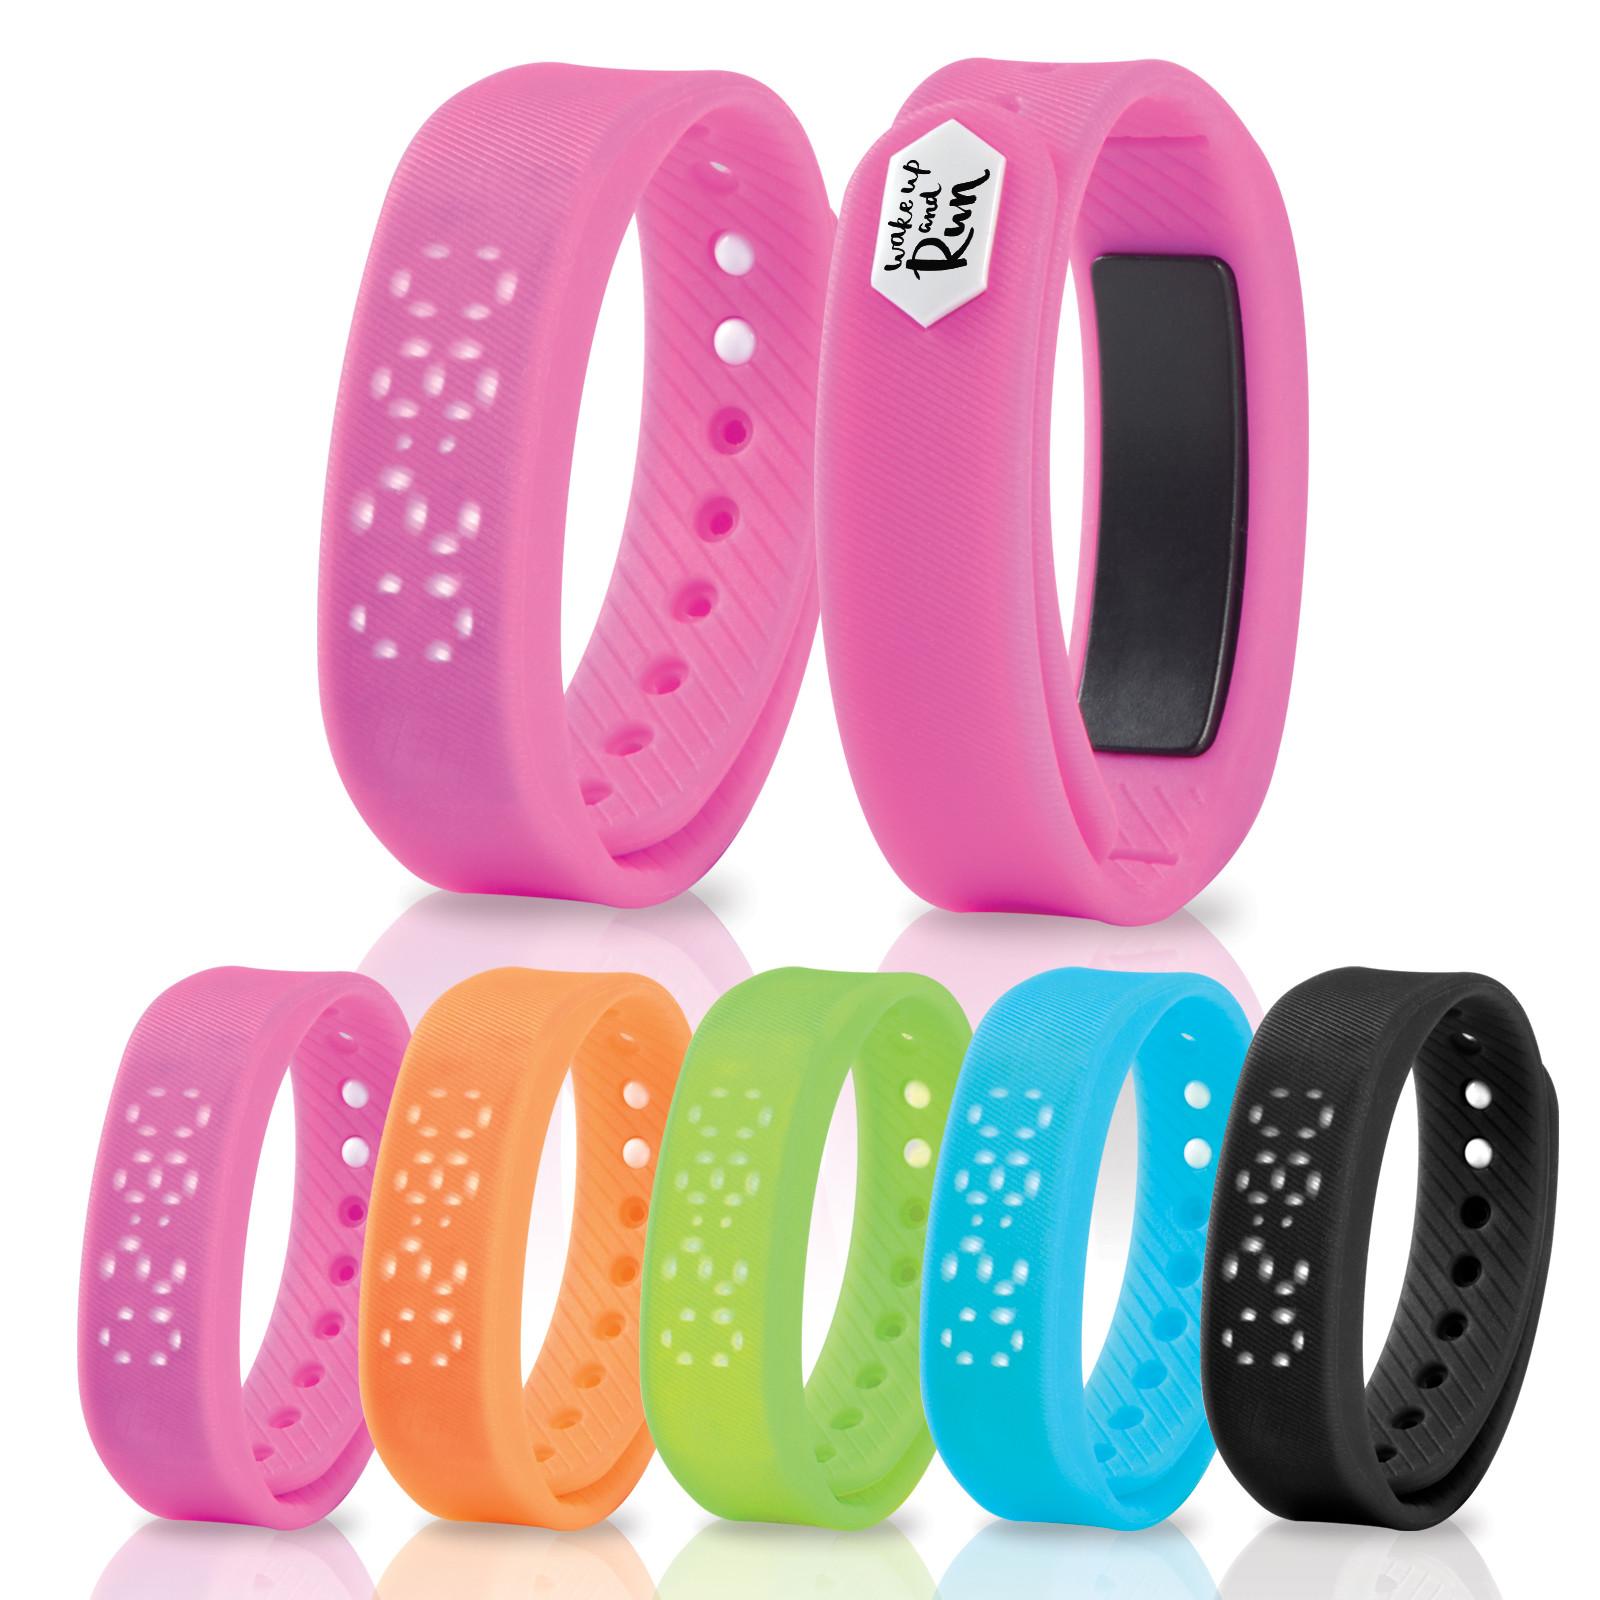 Promotional Product Stride Pedometer Bracelet